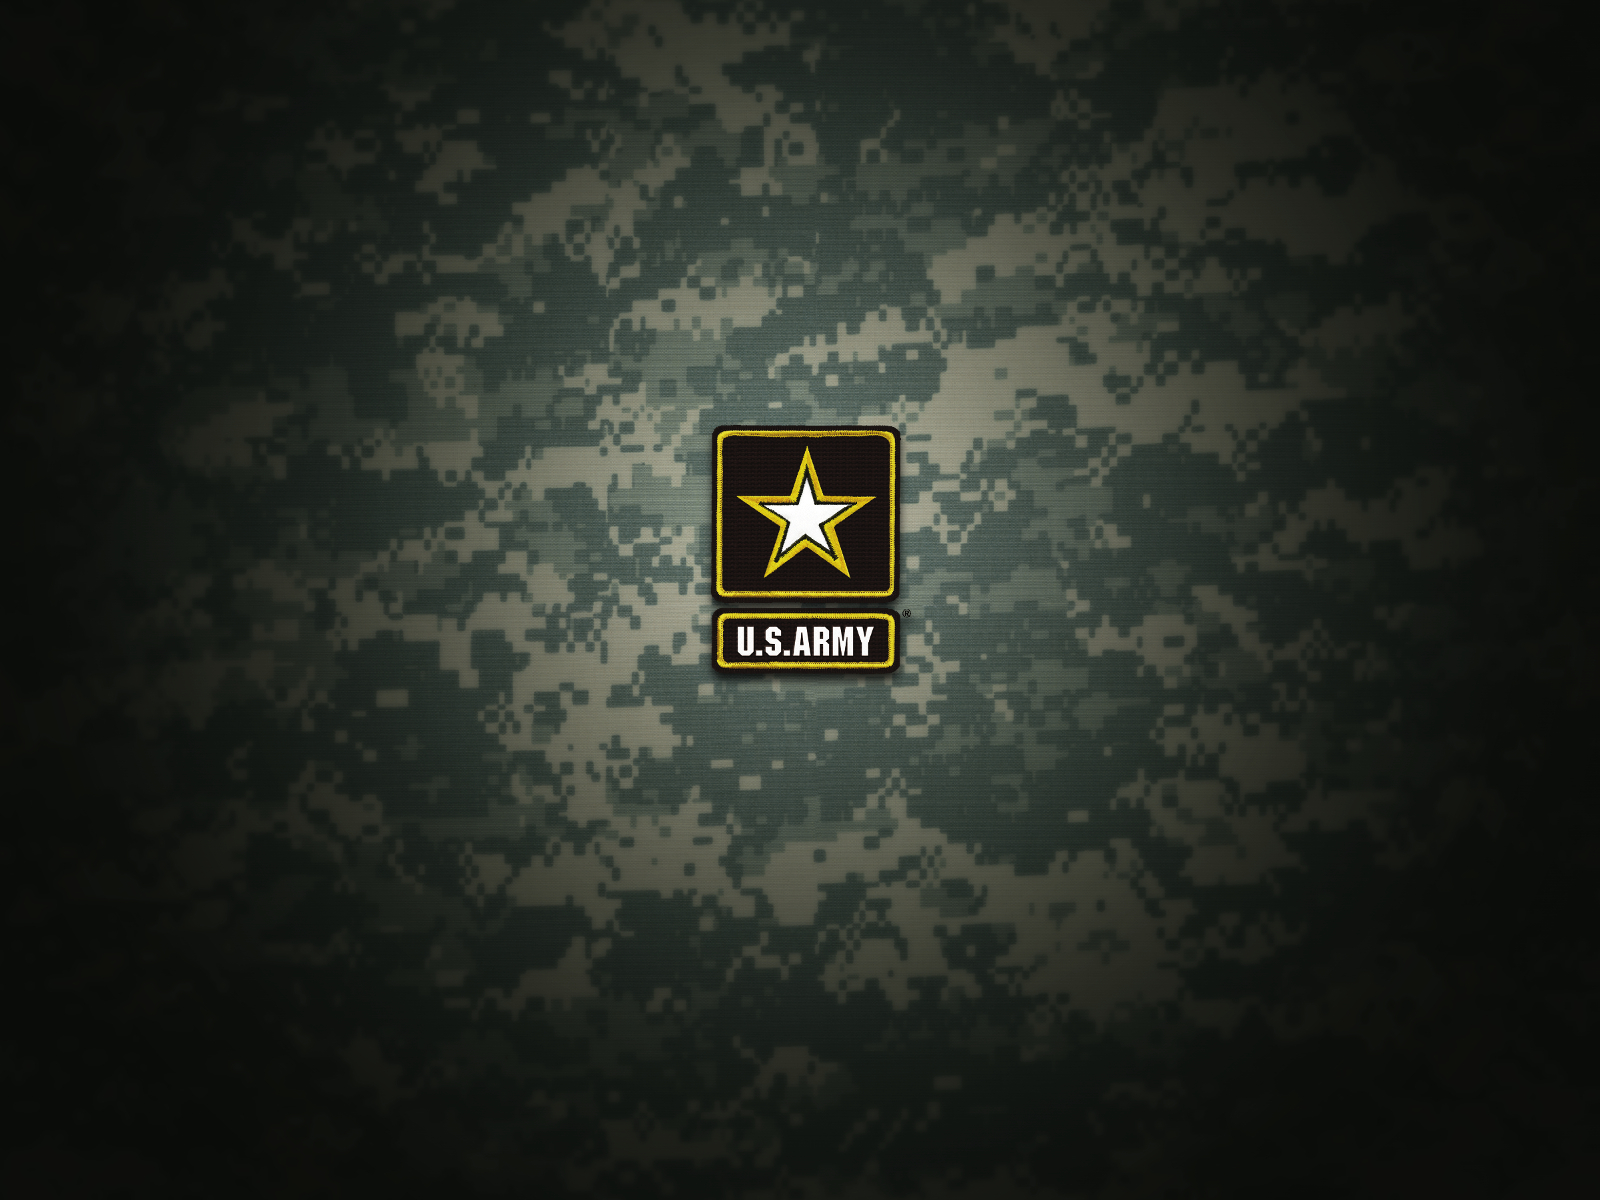 Us Army 1600x1200